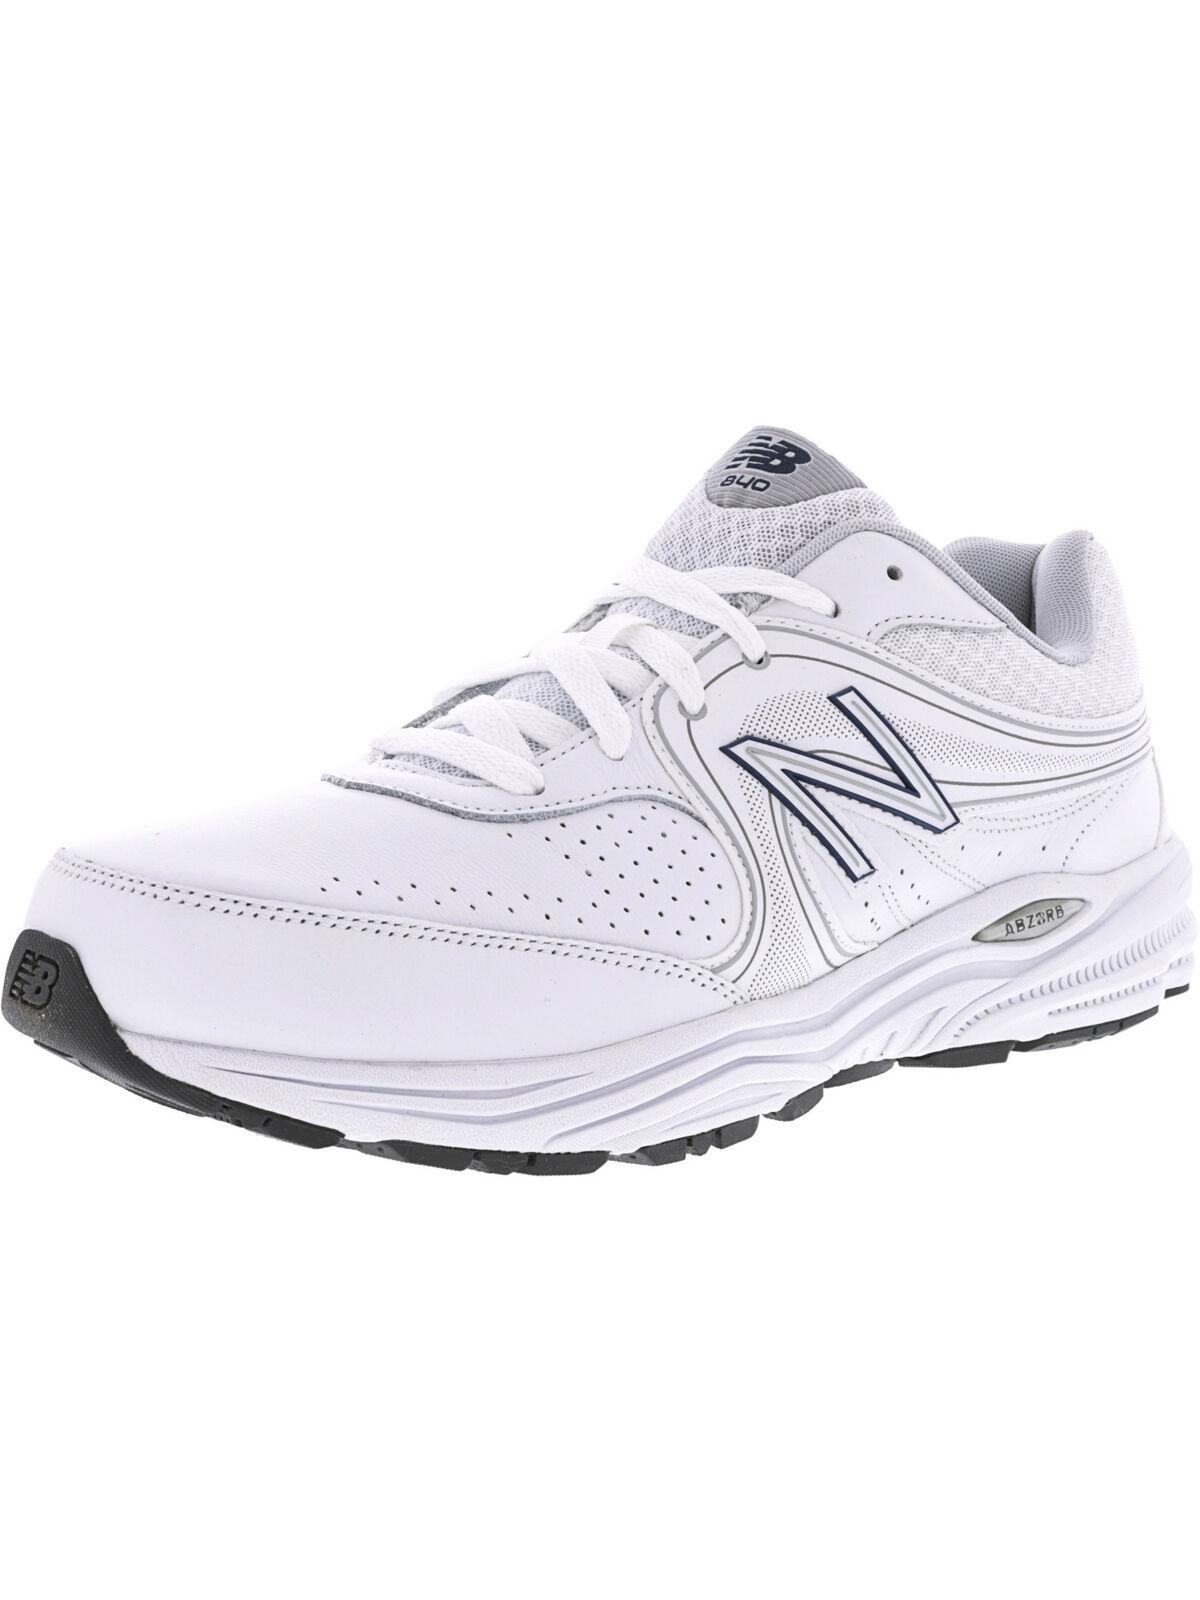 Zapato MW840 Caminar New Balance